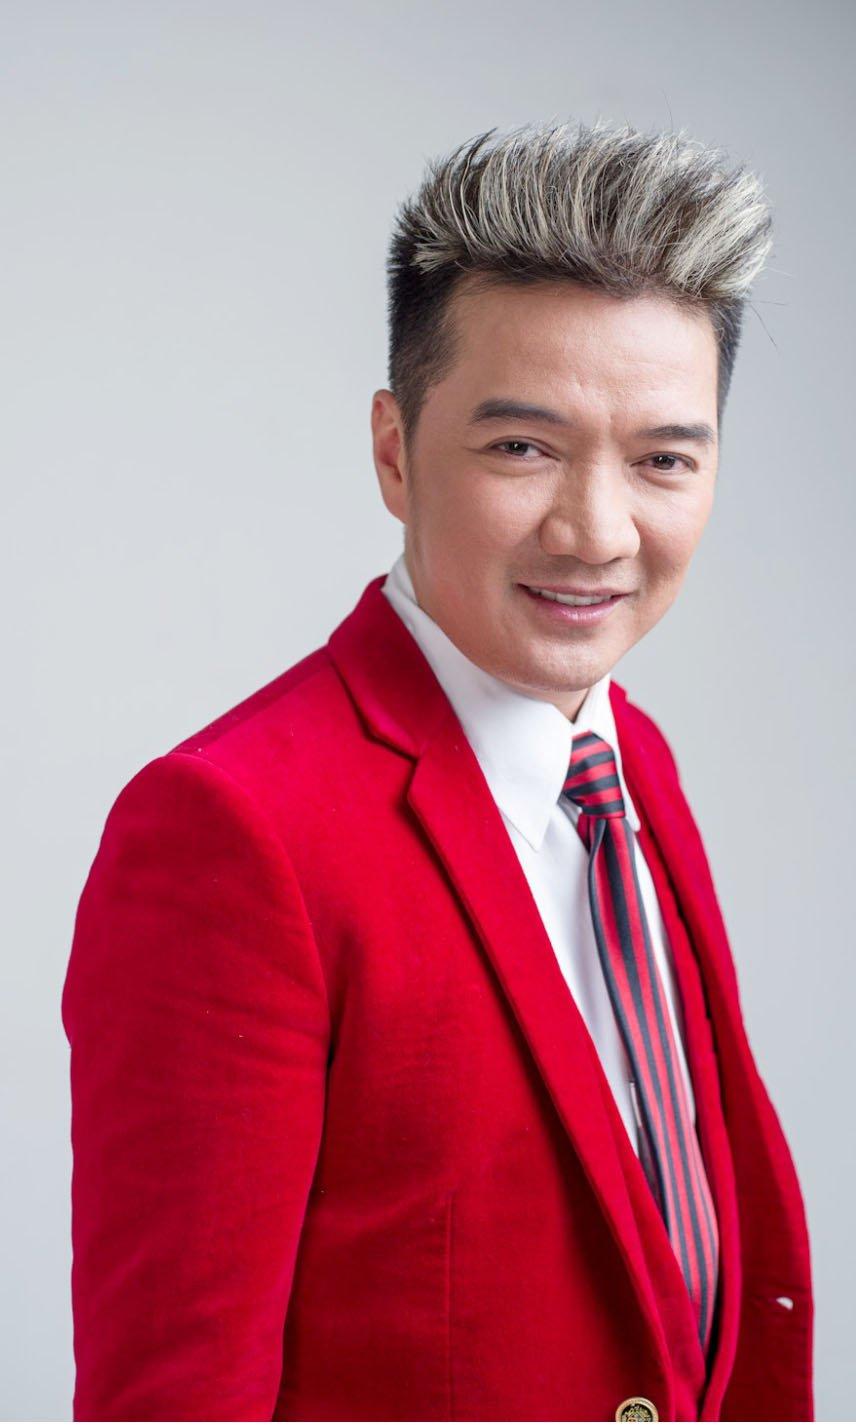 On ao tuyen bo 'co Phuong Thanh thi khong co Dam', Dam Vinh Hung tuc gian phan phao hinh anh 2